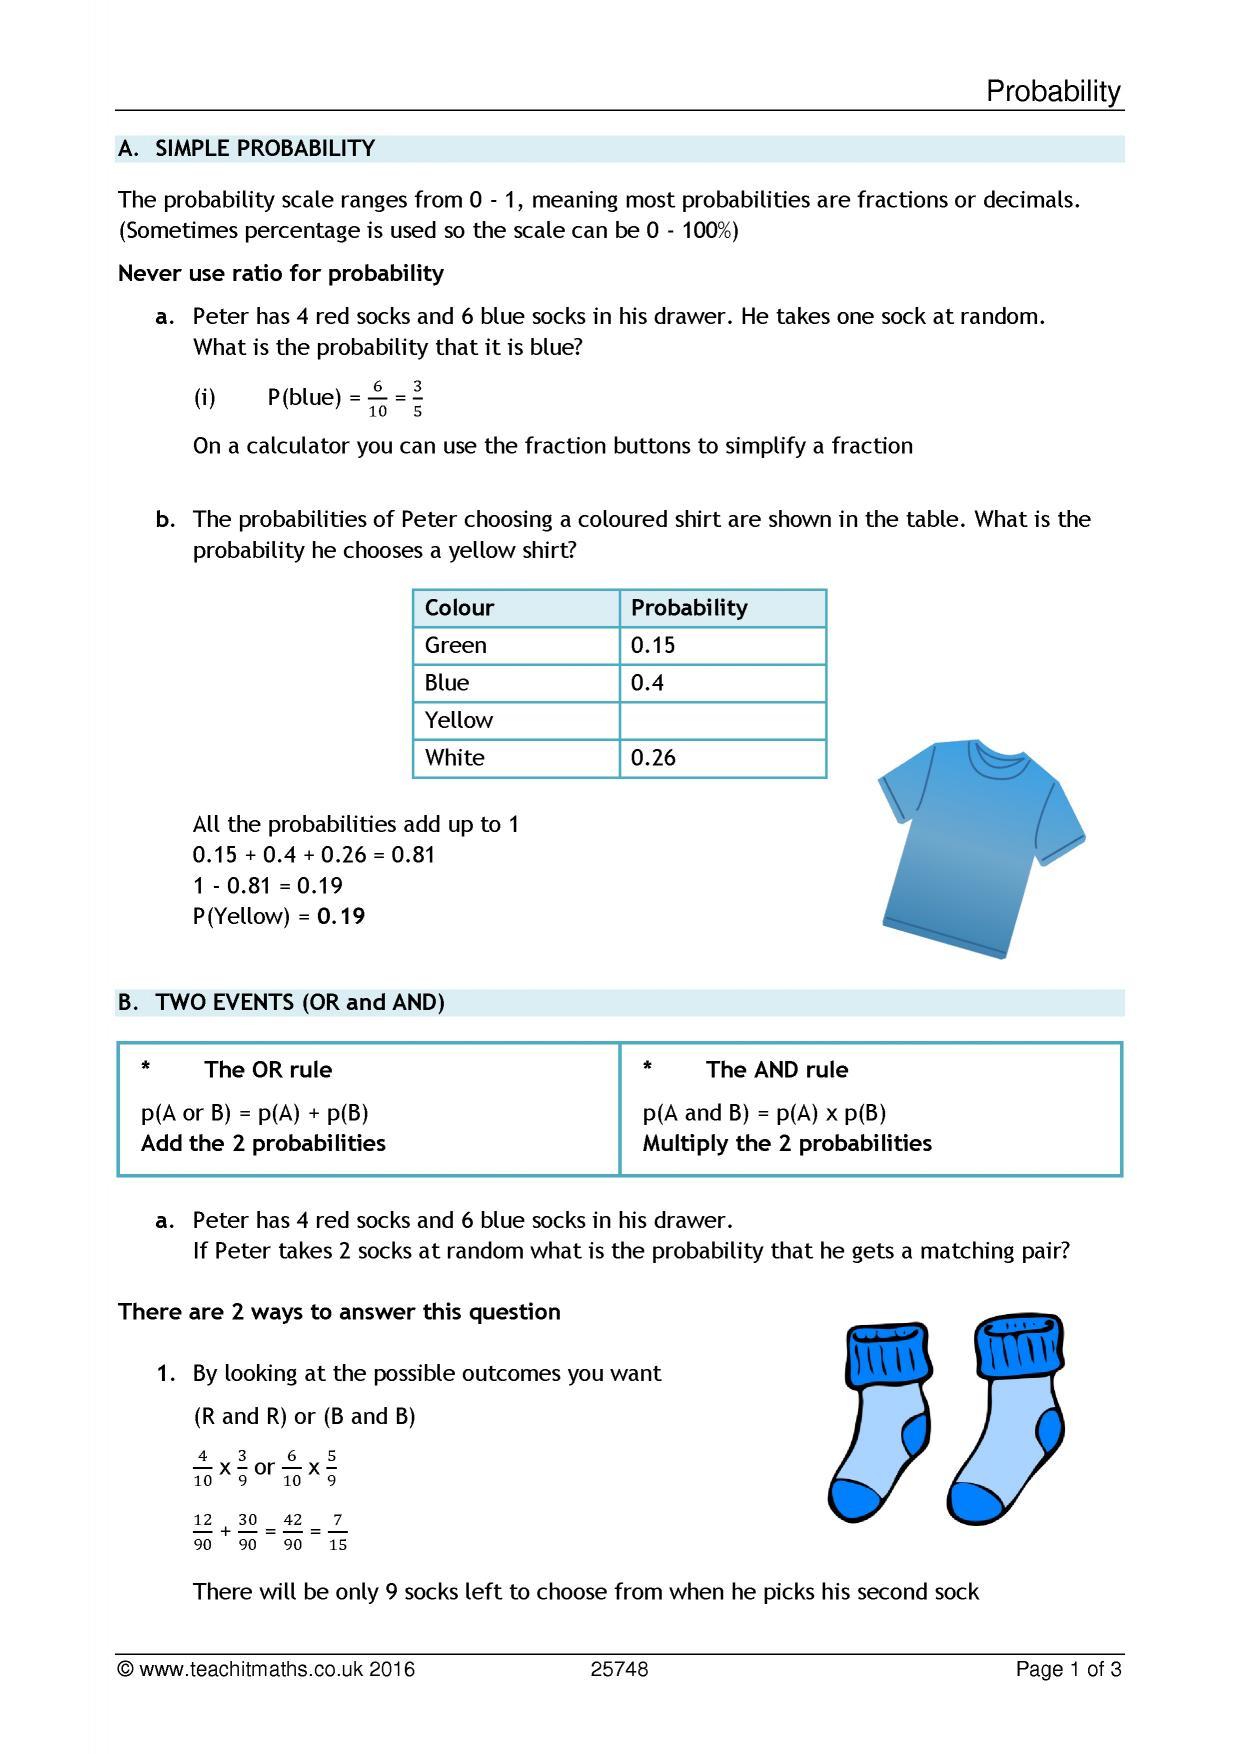 Probability resources   KS4 maths resources - Teachit Maths